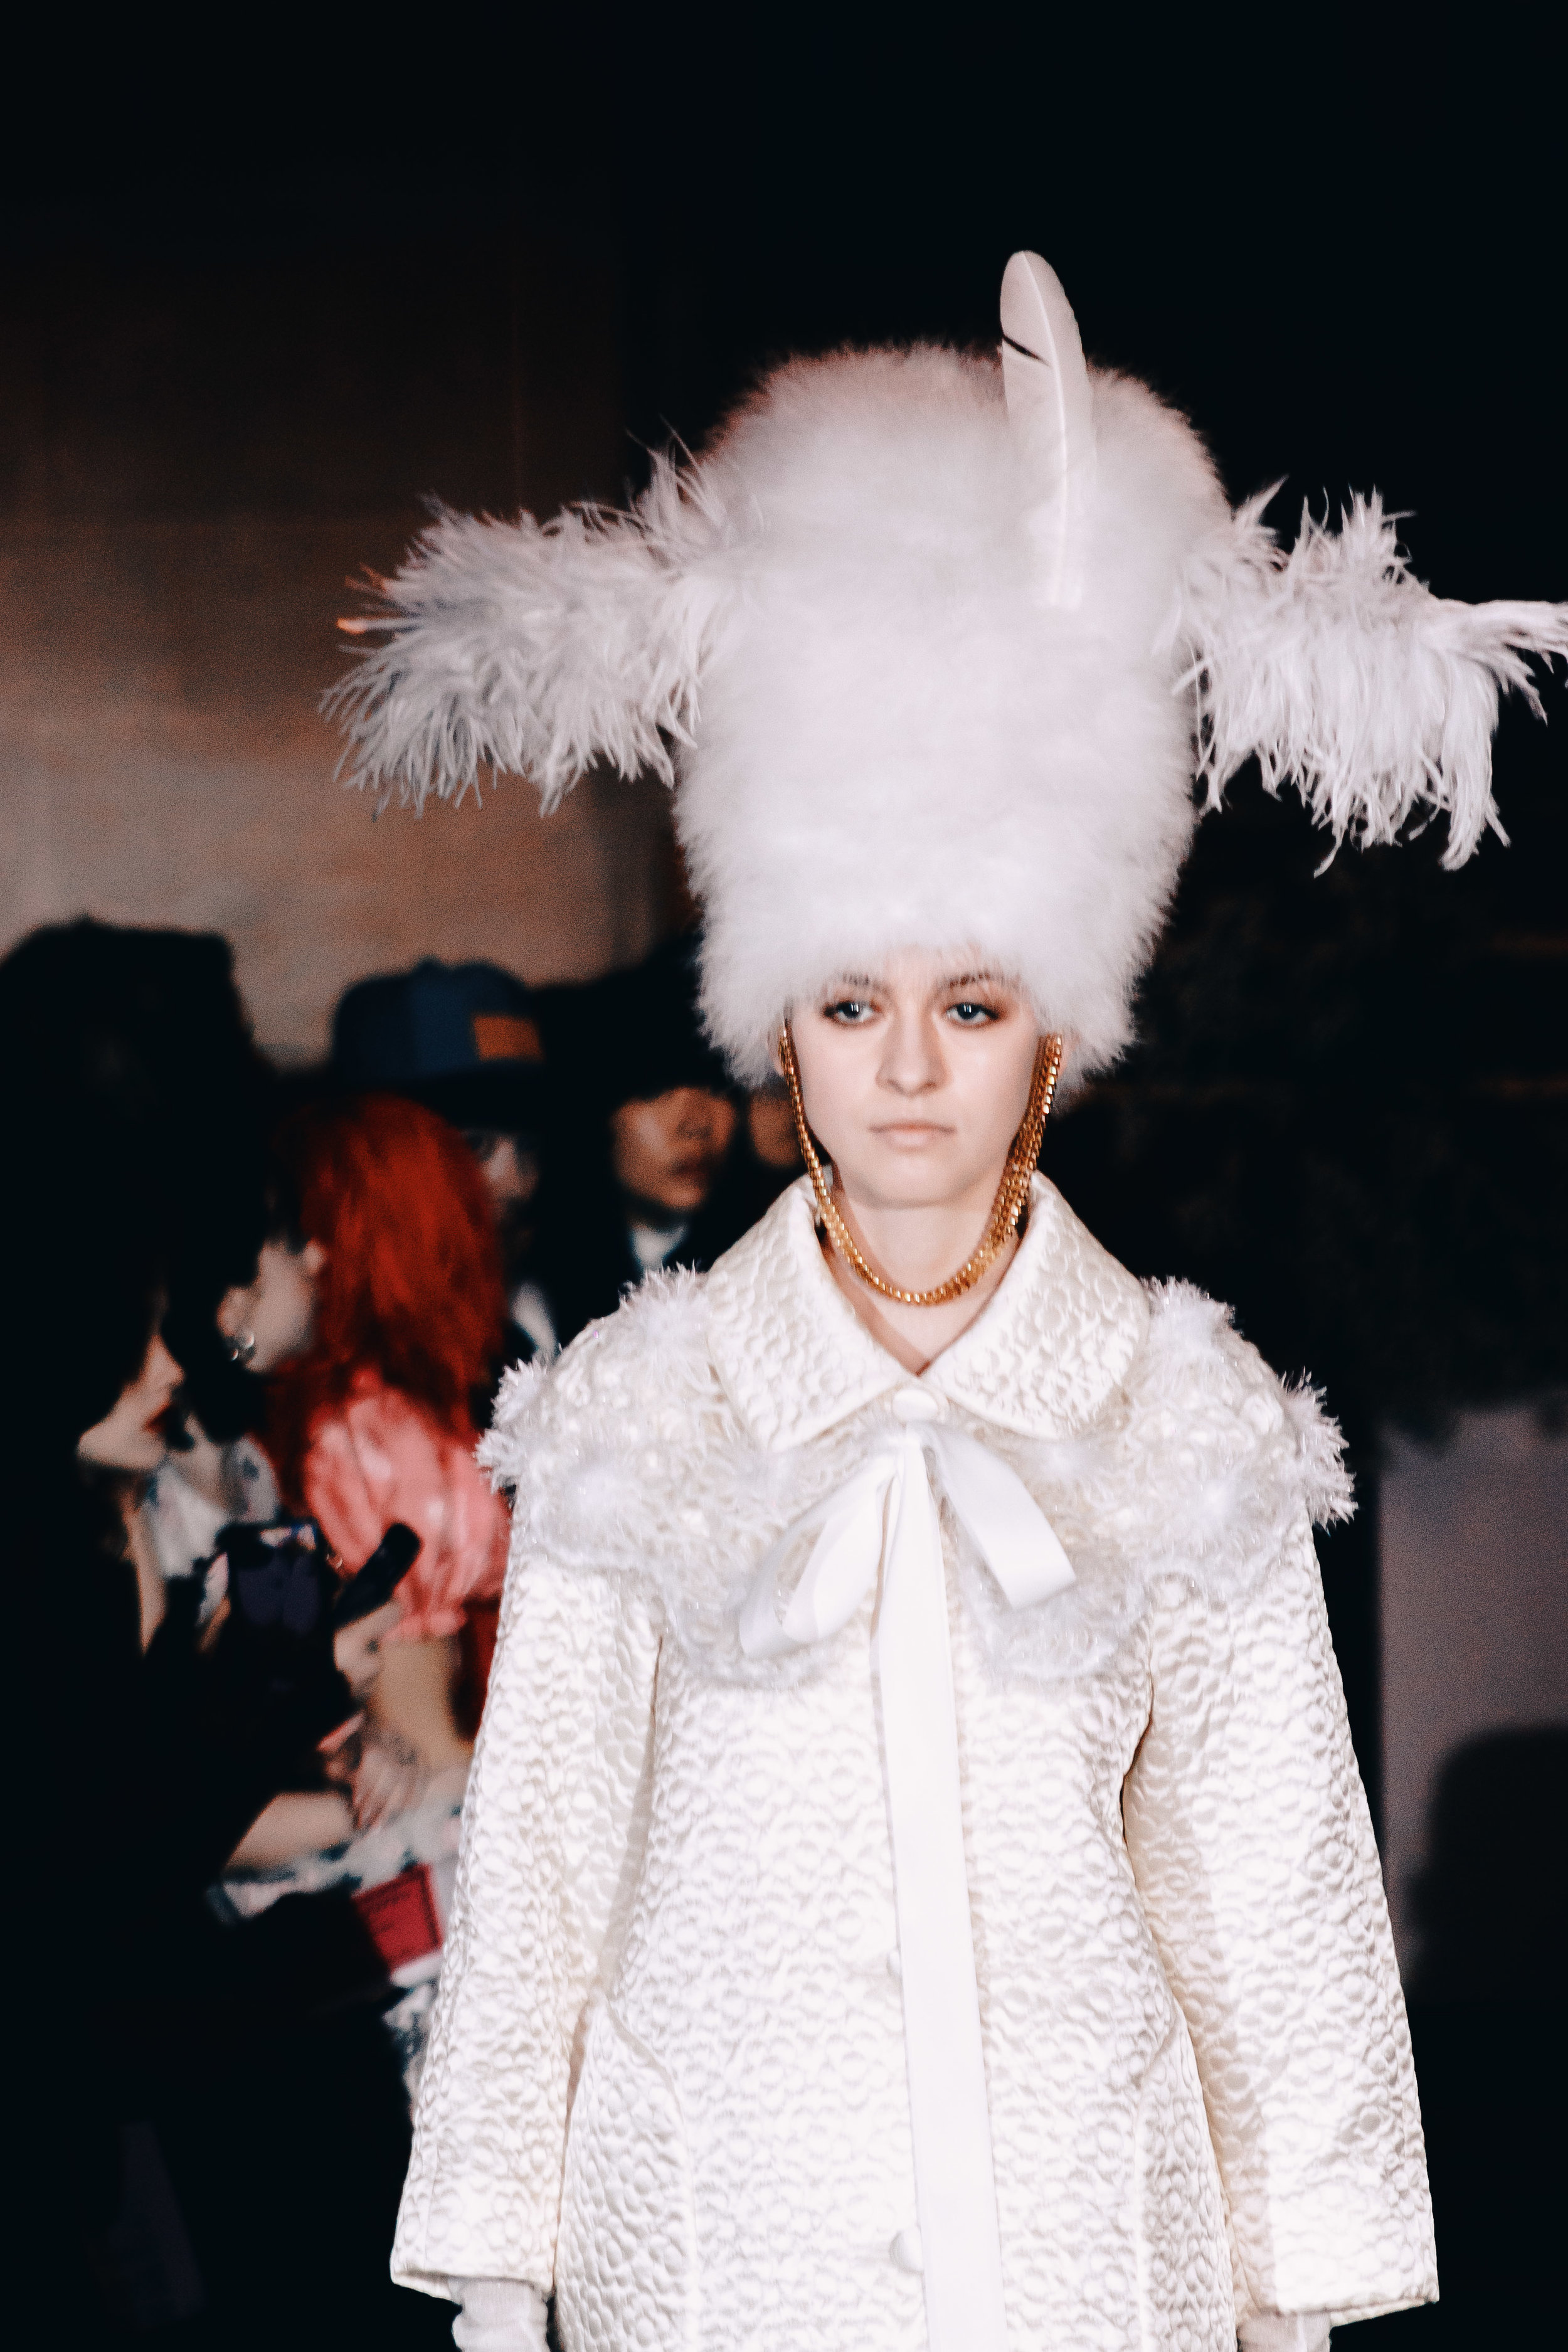 London fashion week Ryan Lo AW19 Adorngirl 12.jpg